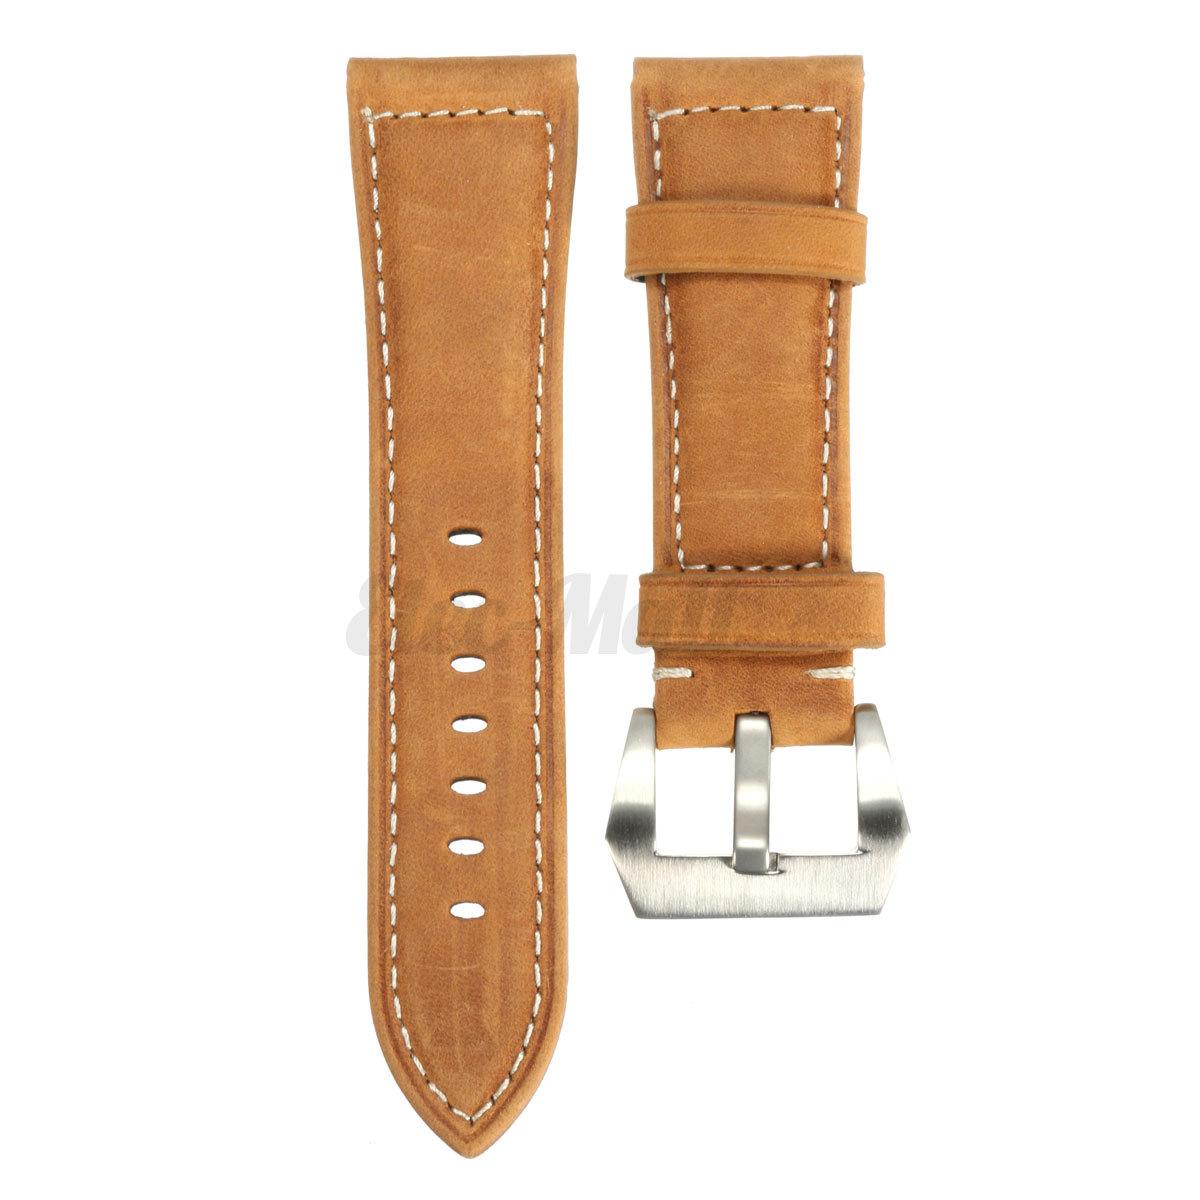 Genuine Leather Watch Band Wrist Strap For Garmin Fenix 3 / HR Smart Watch 26mm